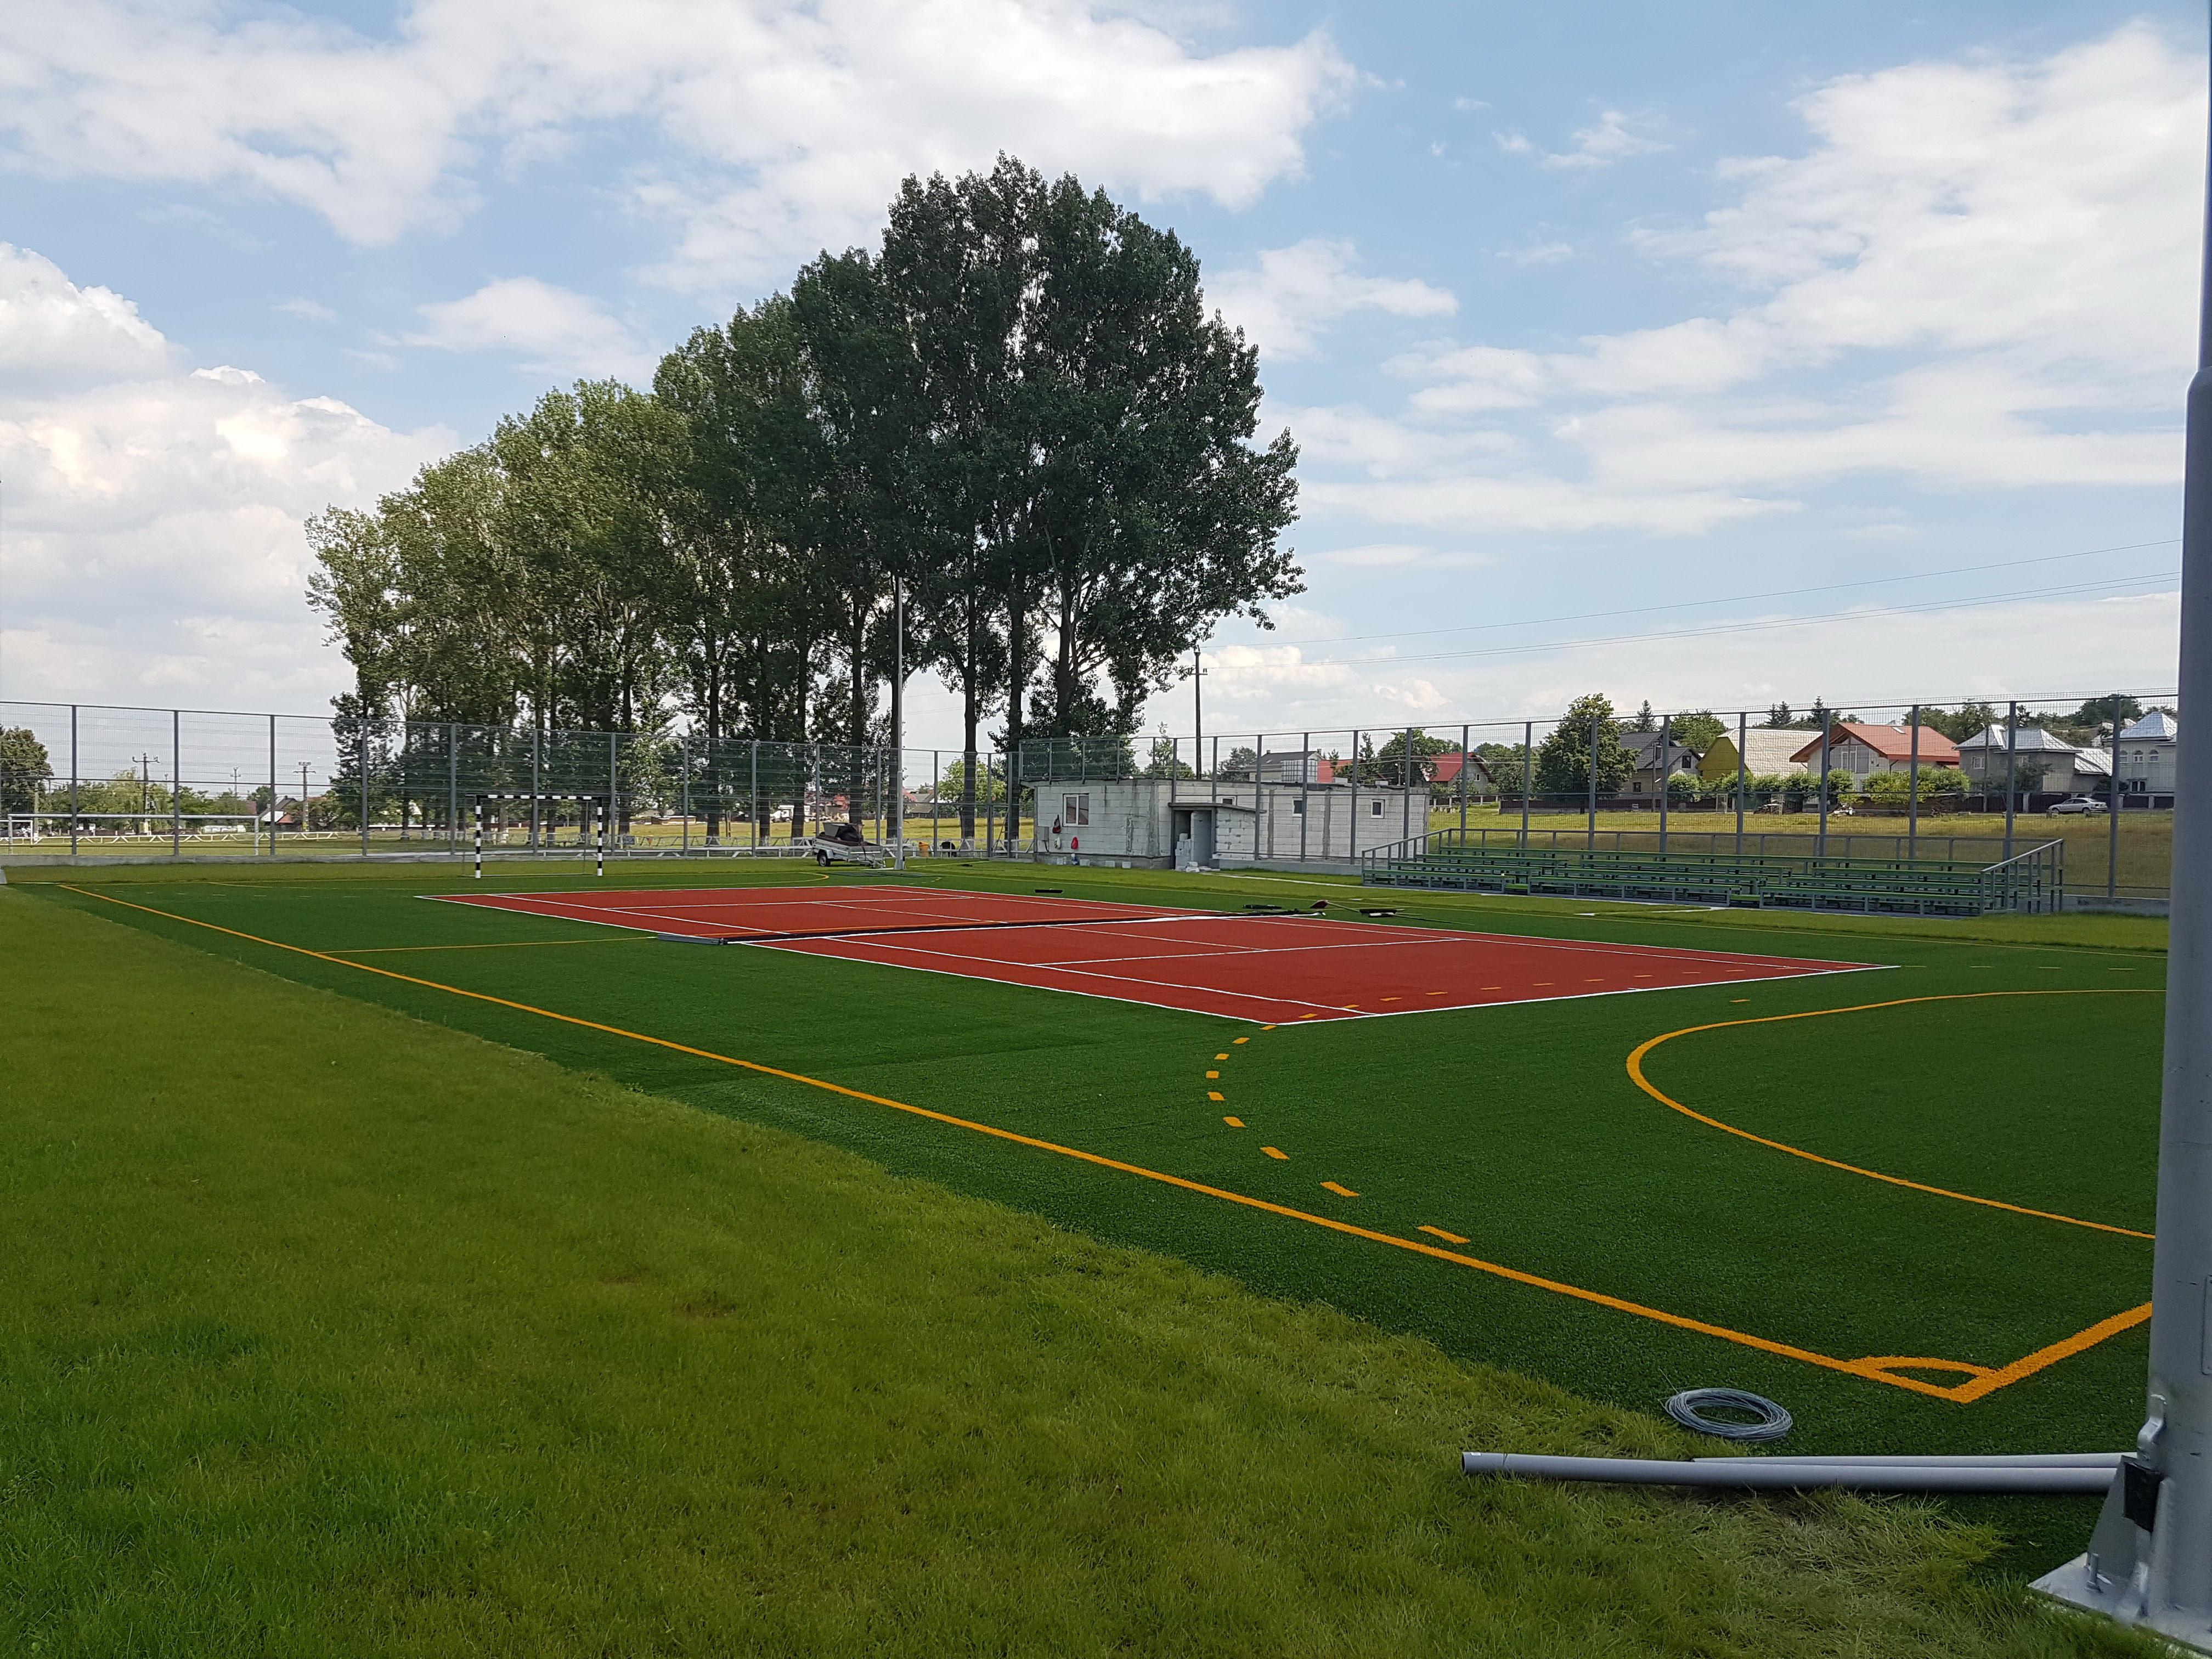 Teren multisport fotbal+tenis Volovăţ, jud Suceava